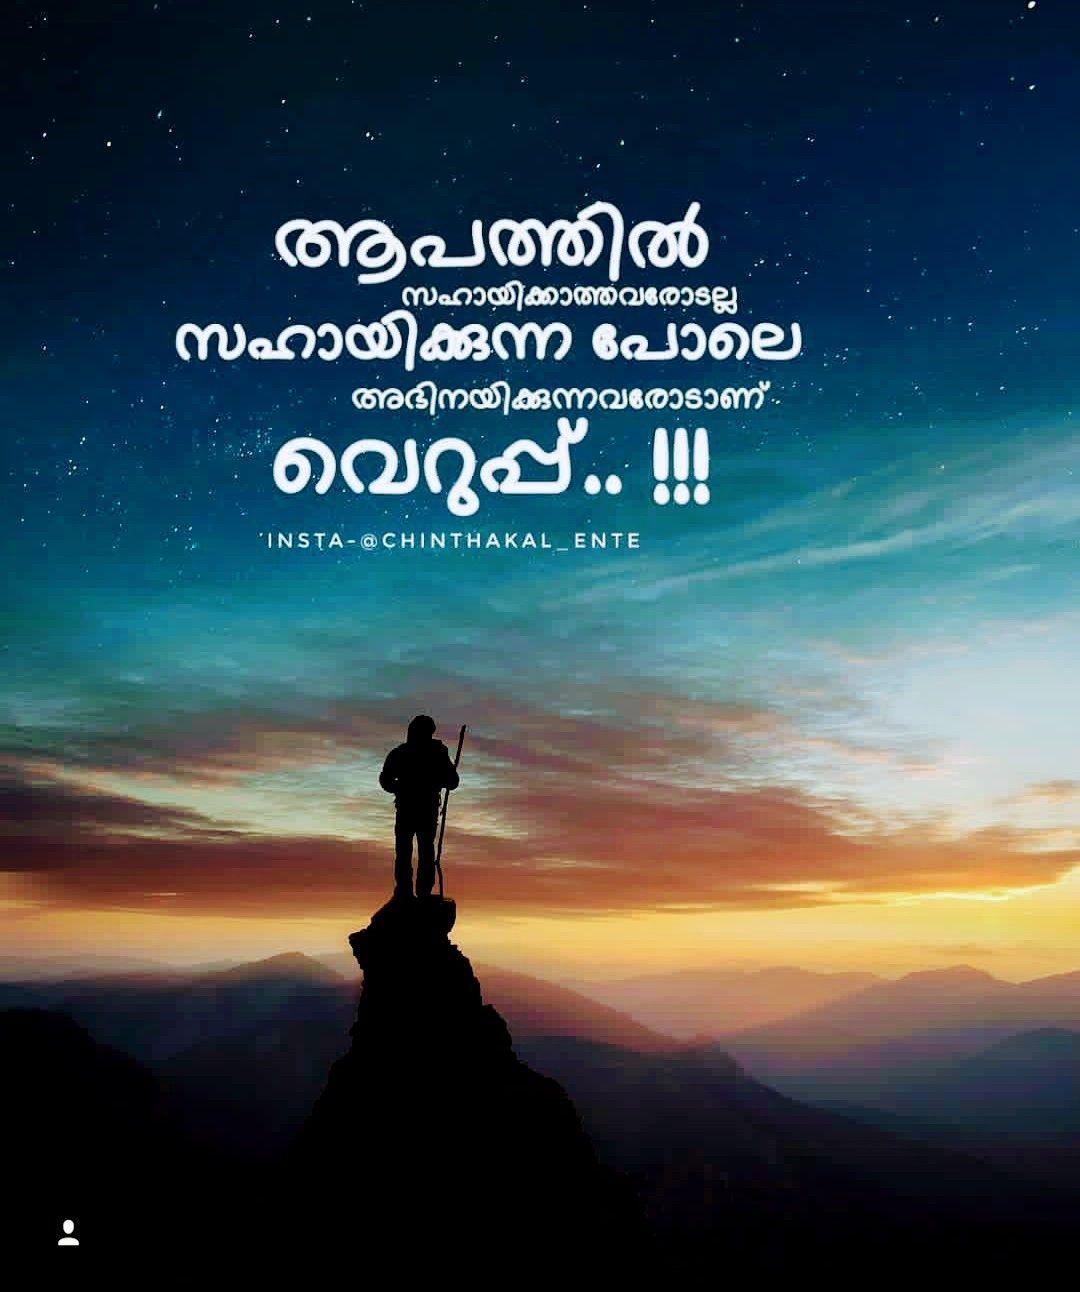 Inspirational Quotes Joker Quotes Malayalam Feathery Minion